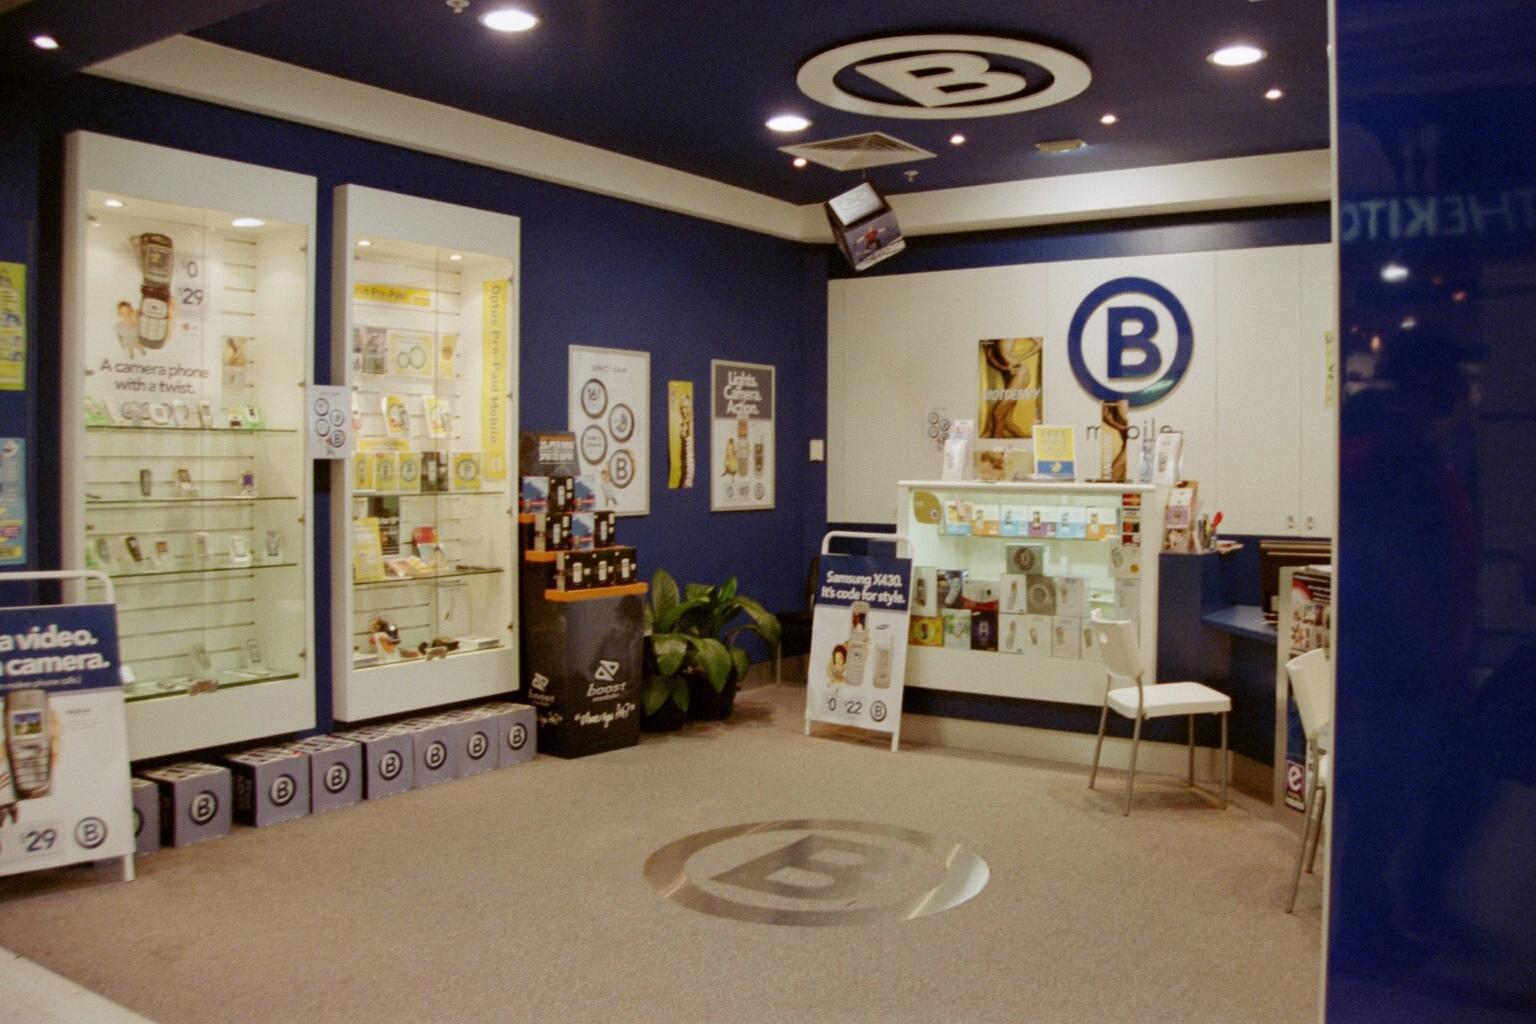 'B' [concept store] - Westfield Whitfords. W.Australia